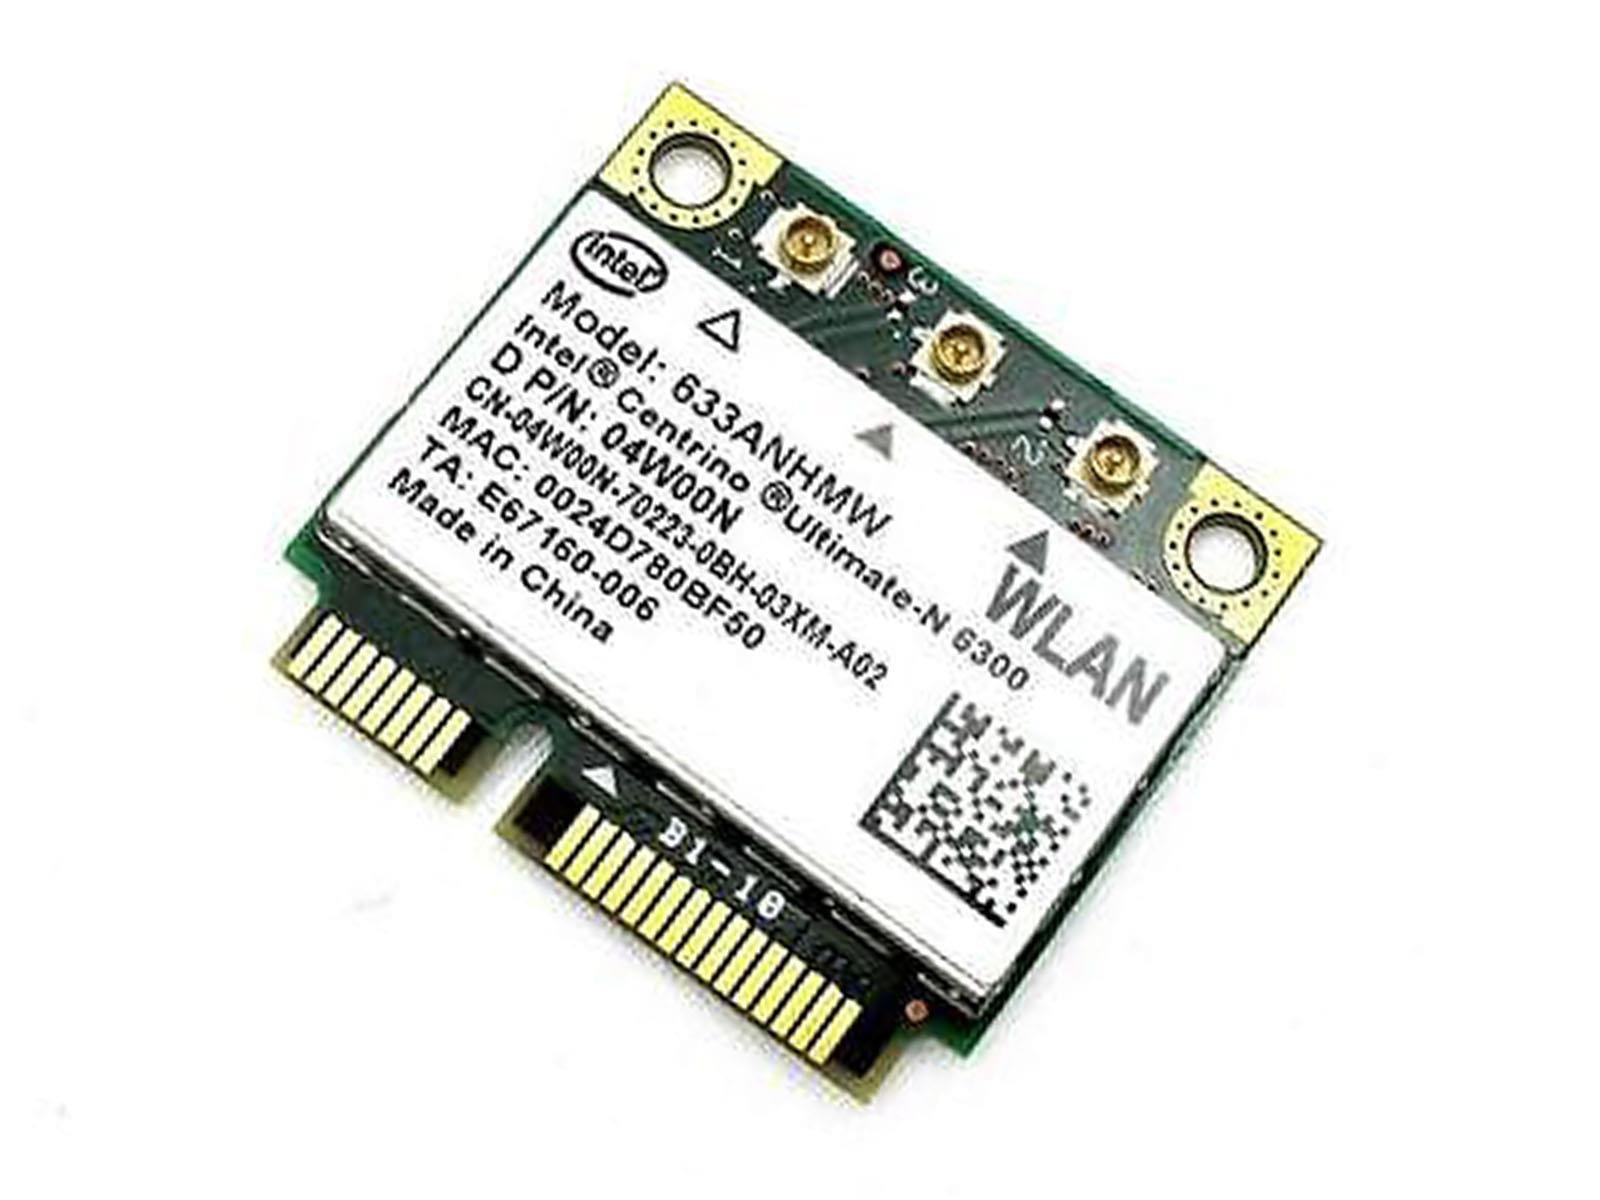 Intel 6300 633ANHMW Half Mini PCIe PCI-express 450MB Wireless WLAN Wifi Card Module 802.11 abgn by Intel